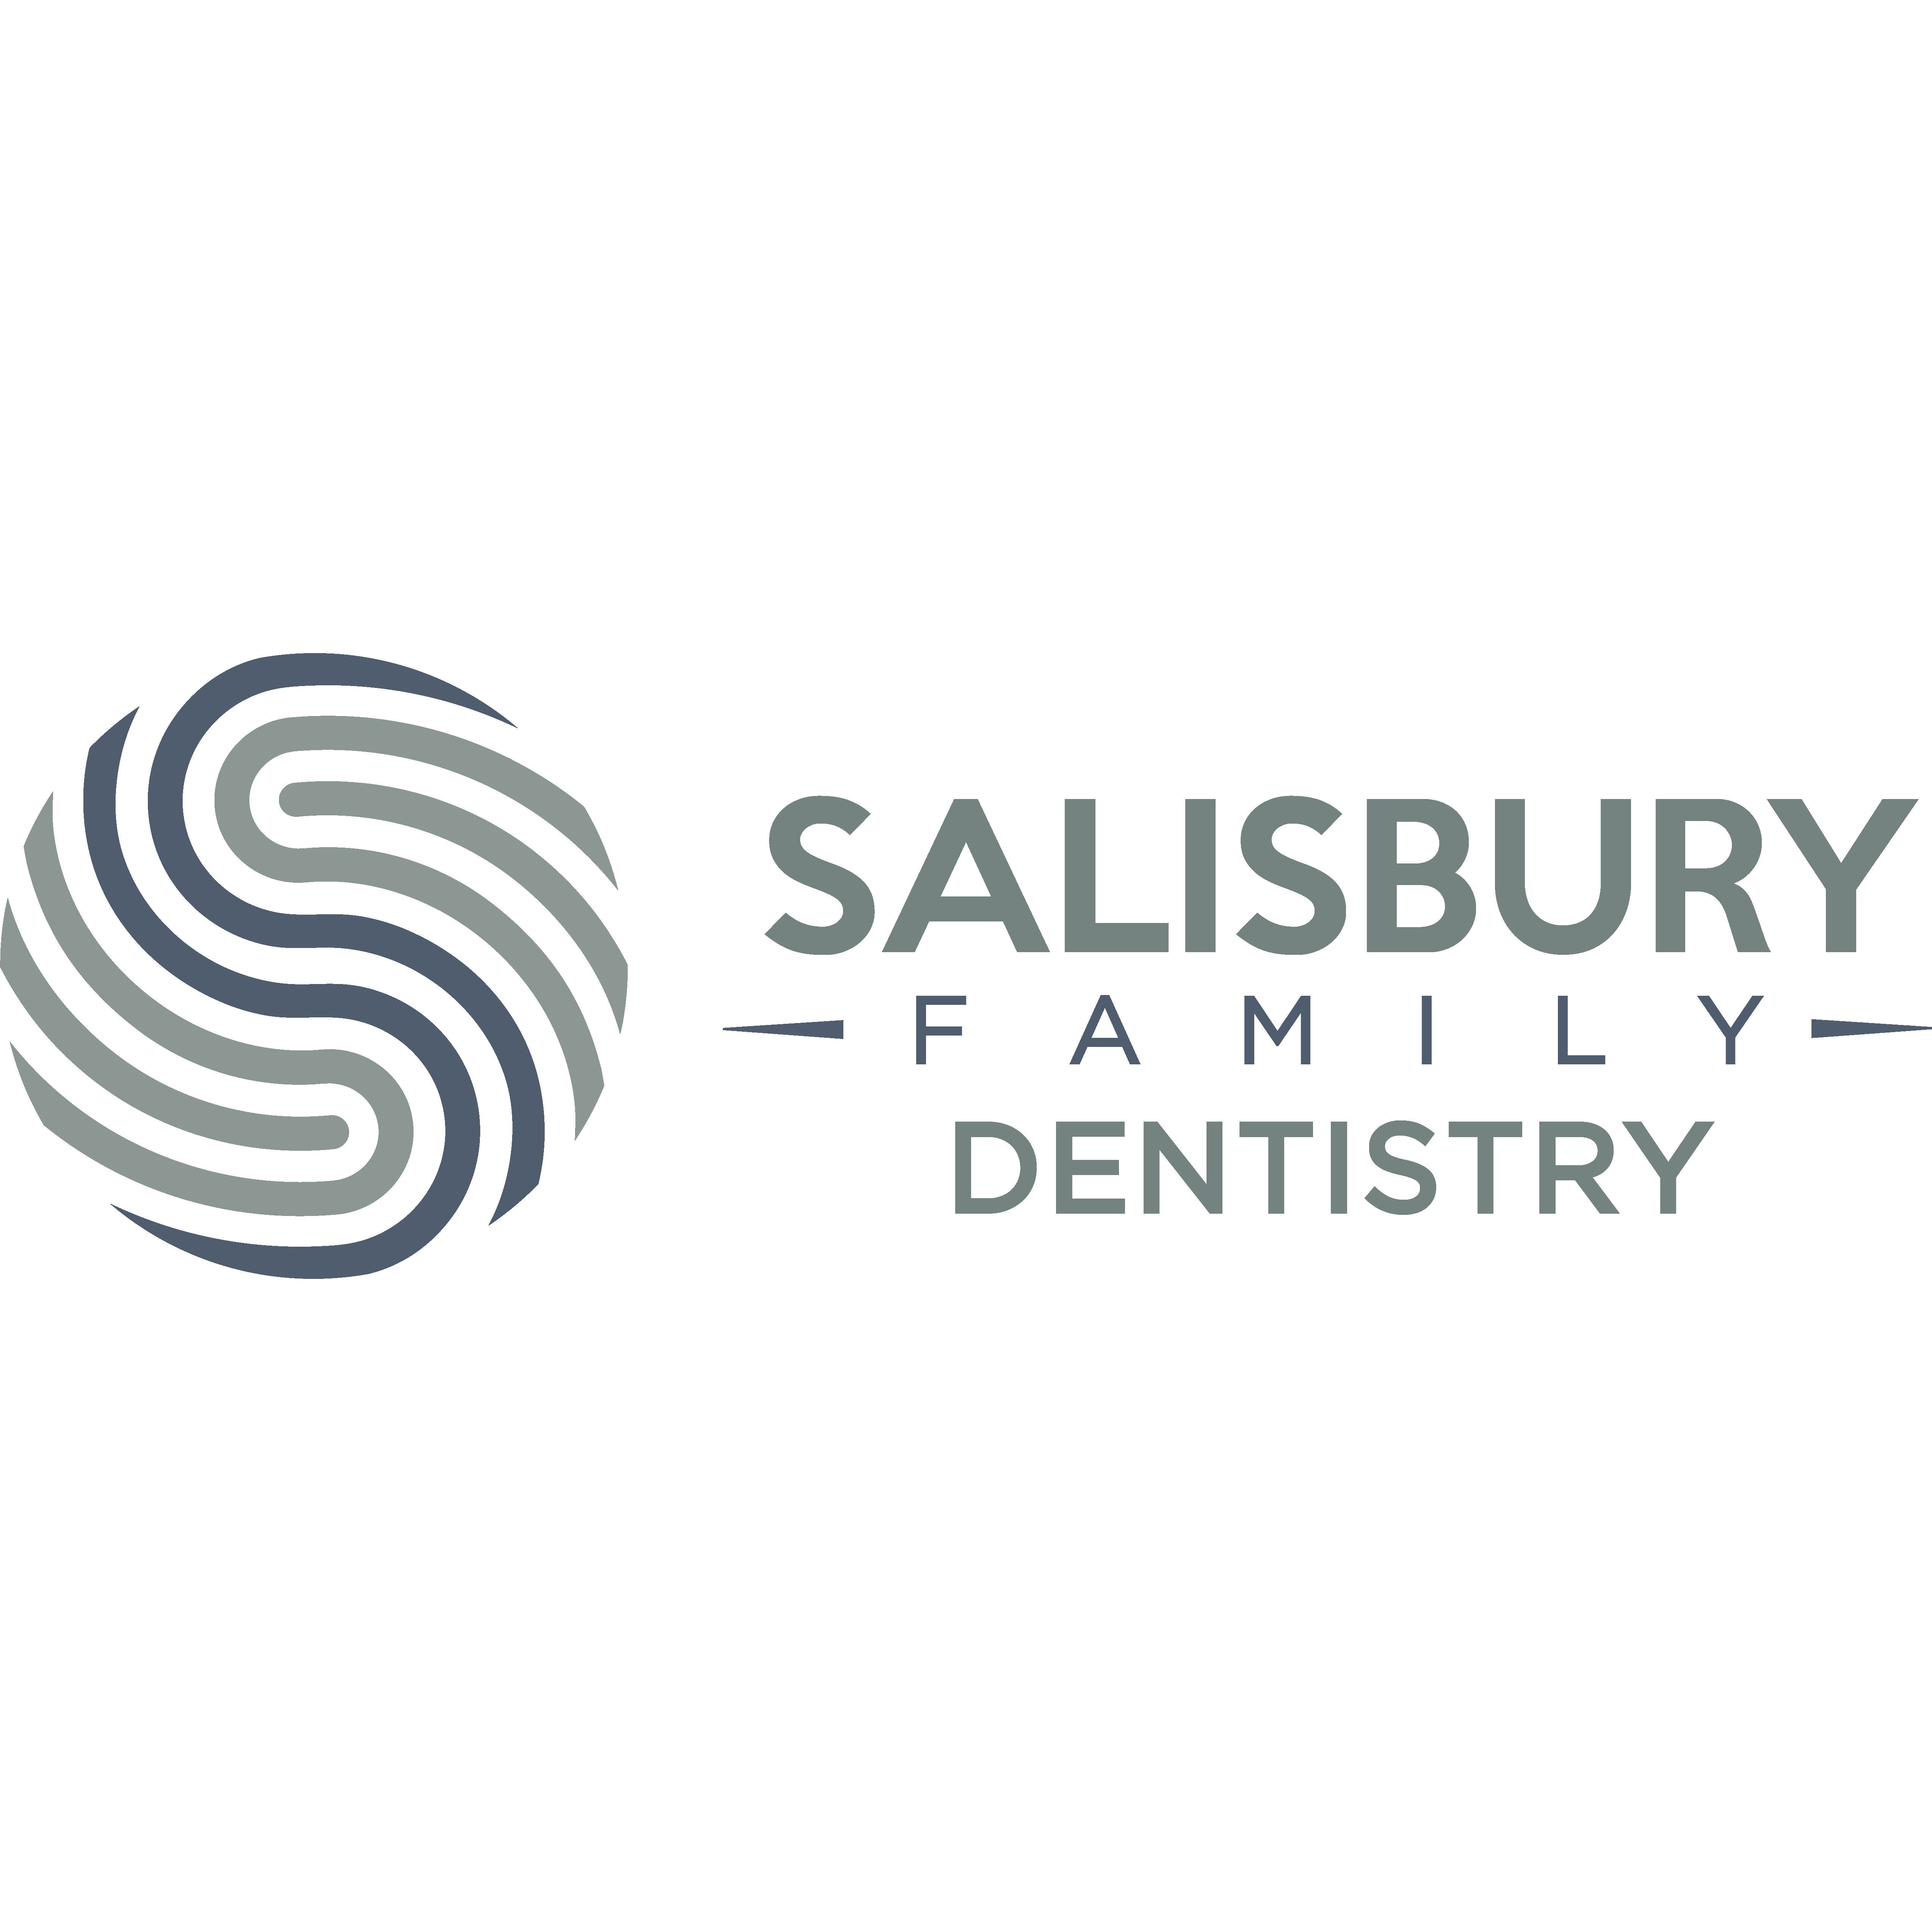 Lower Creek Family Dentistry